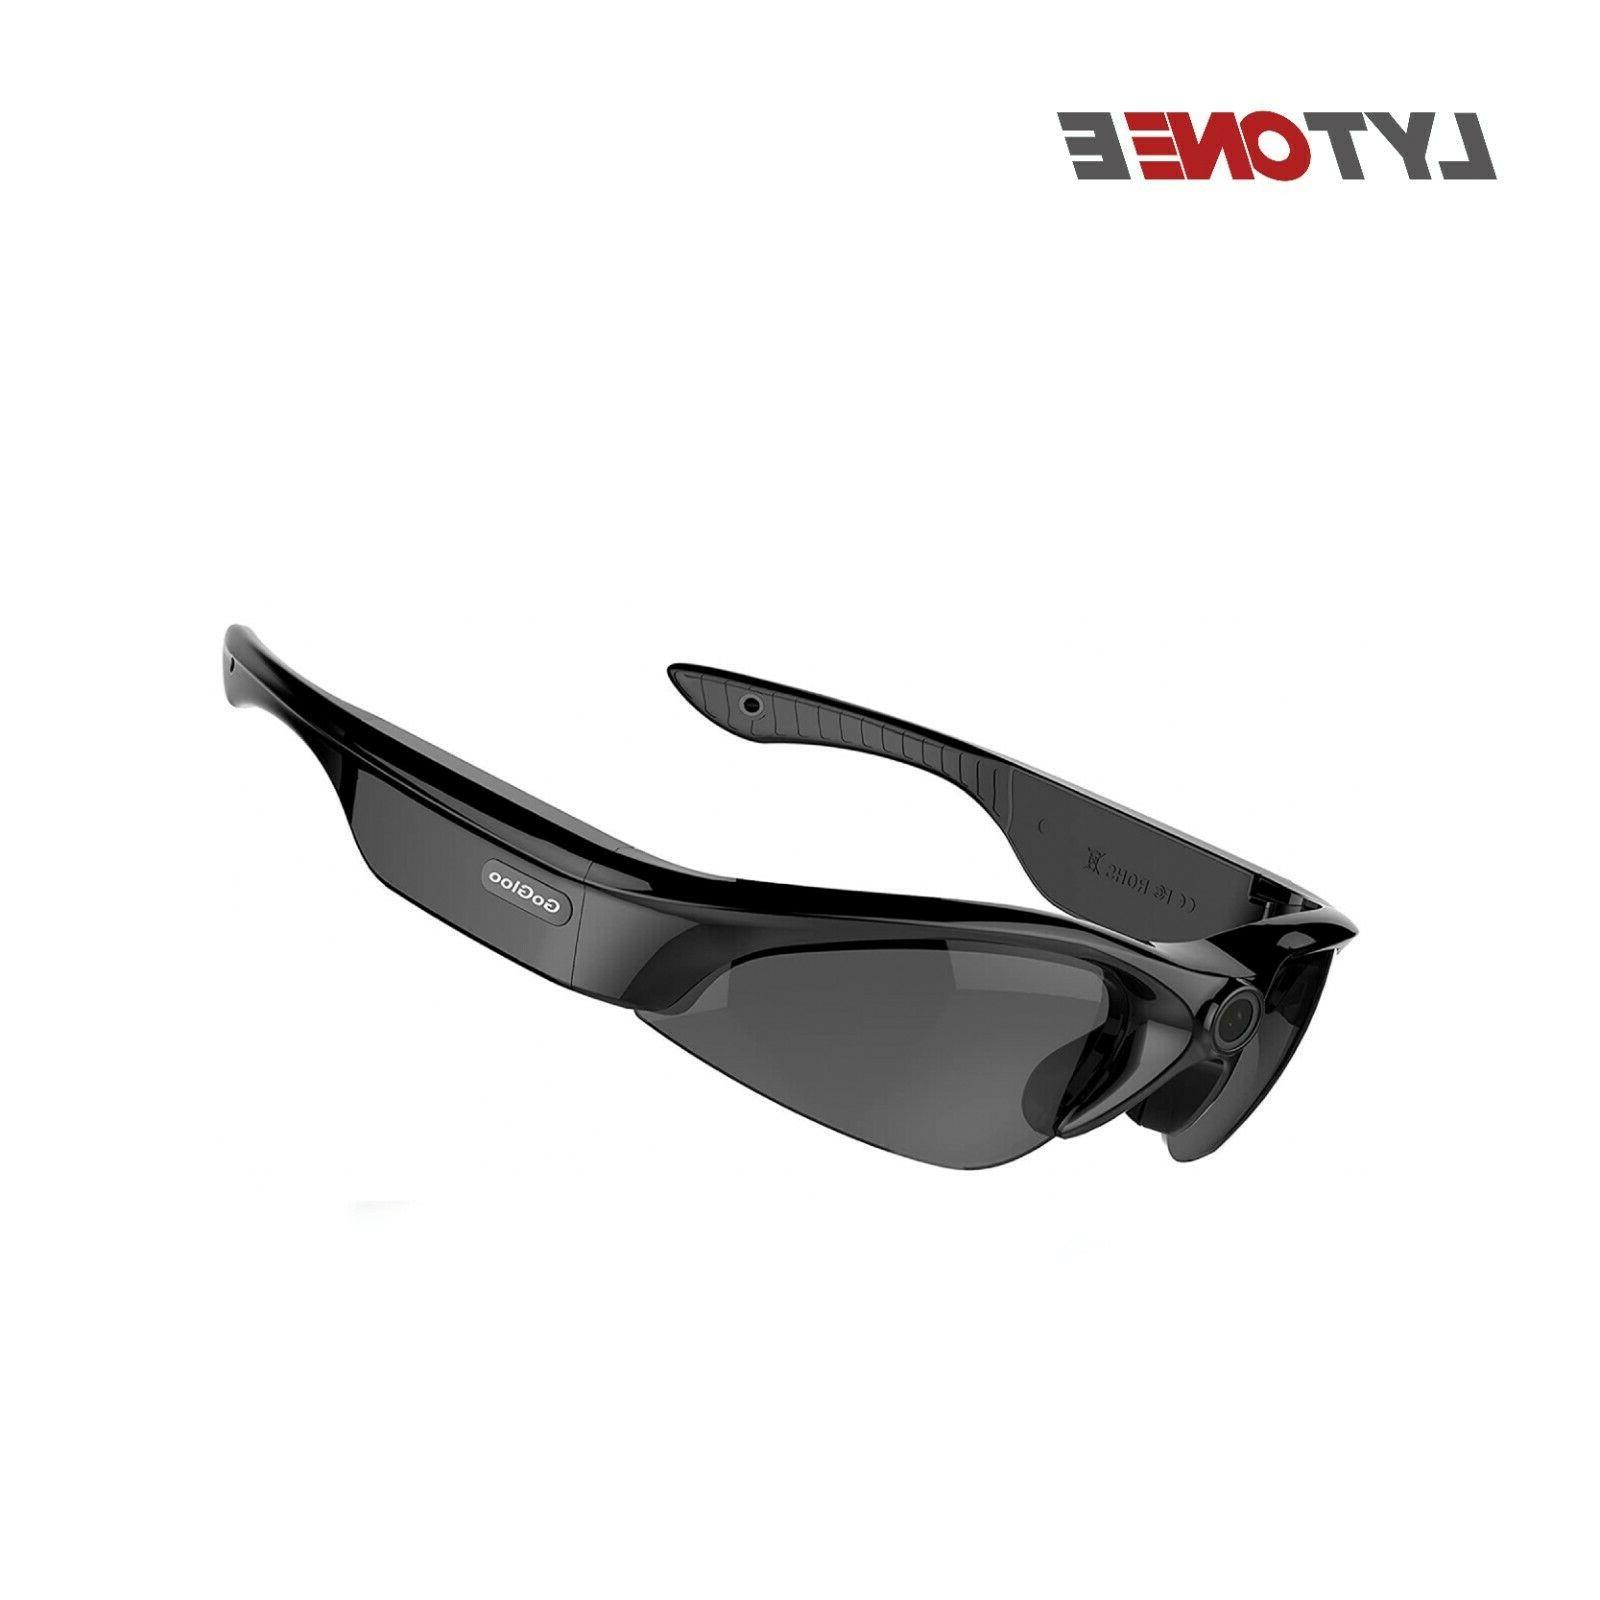 HD Eye Glasses Camera Sports Action Camera 30fps 150 Degree